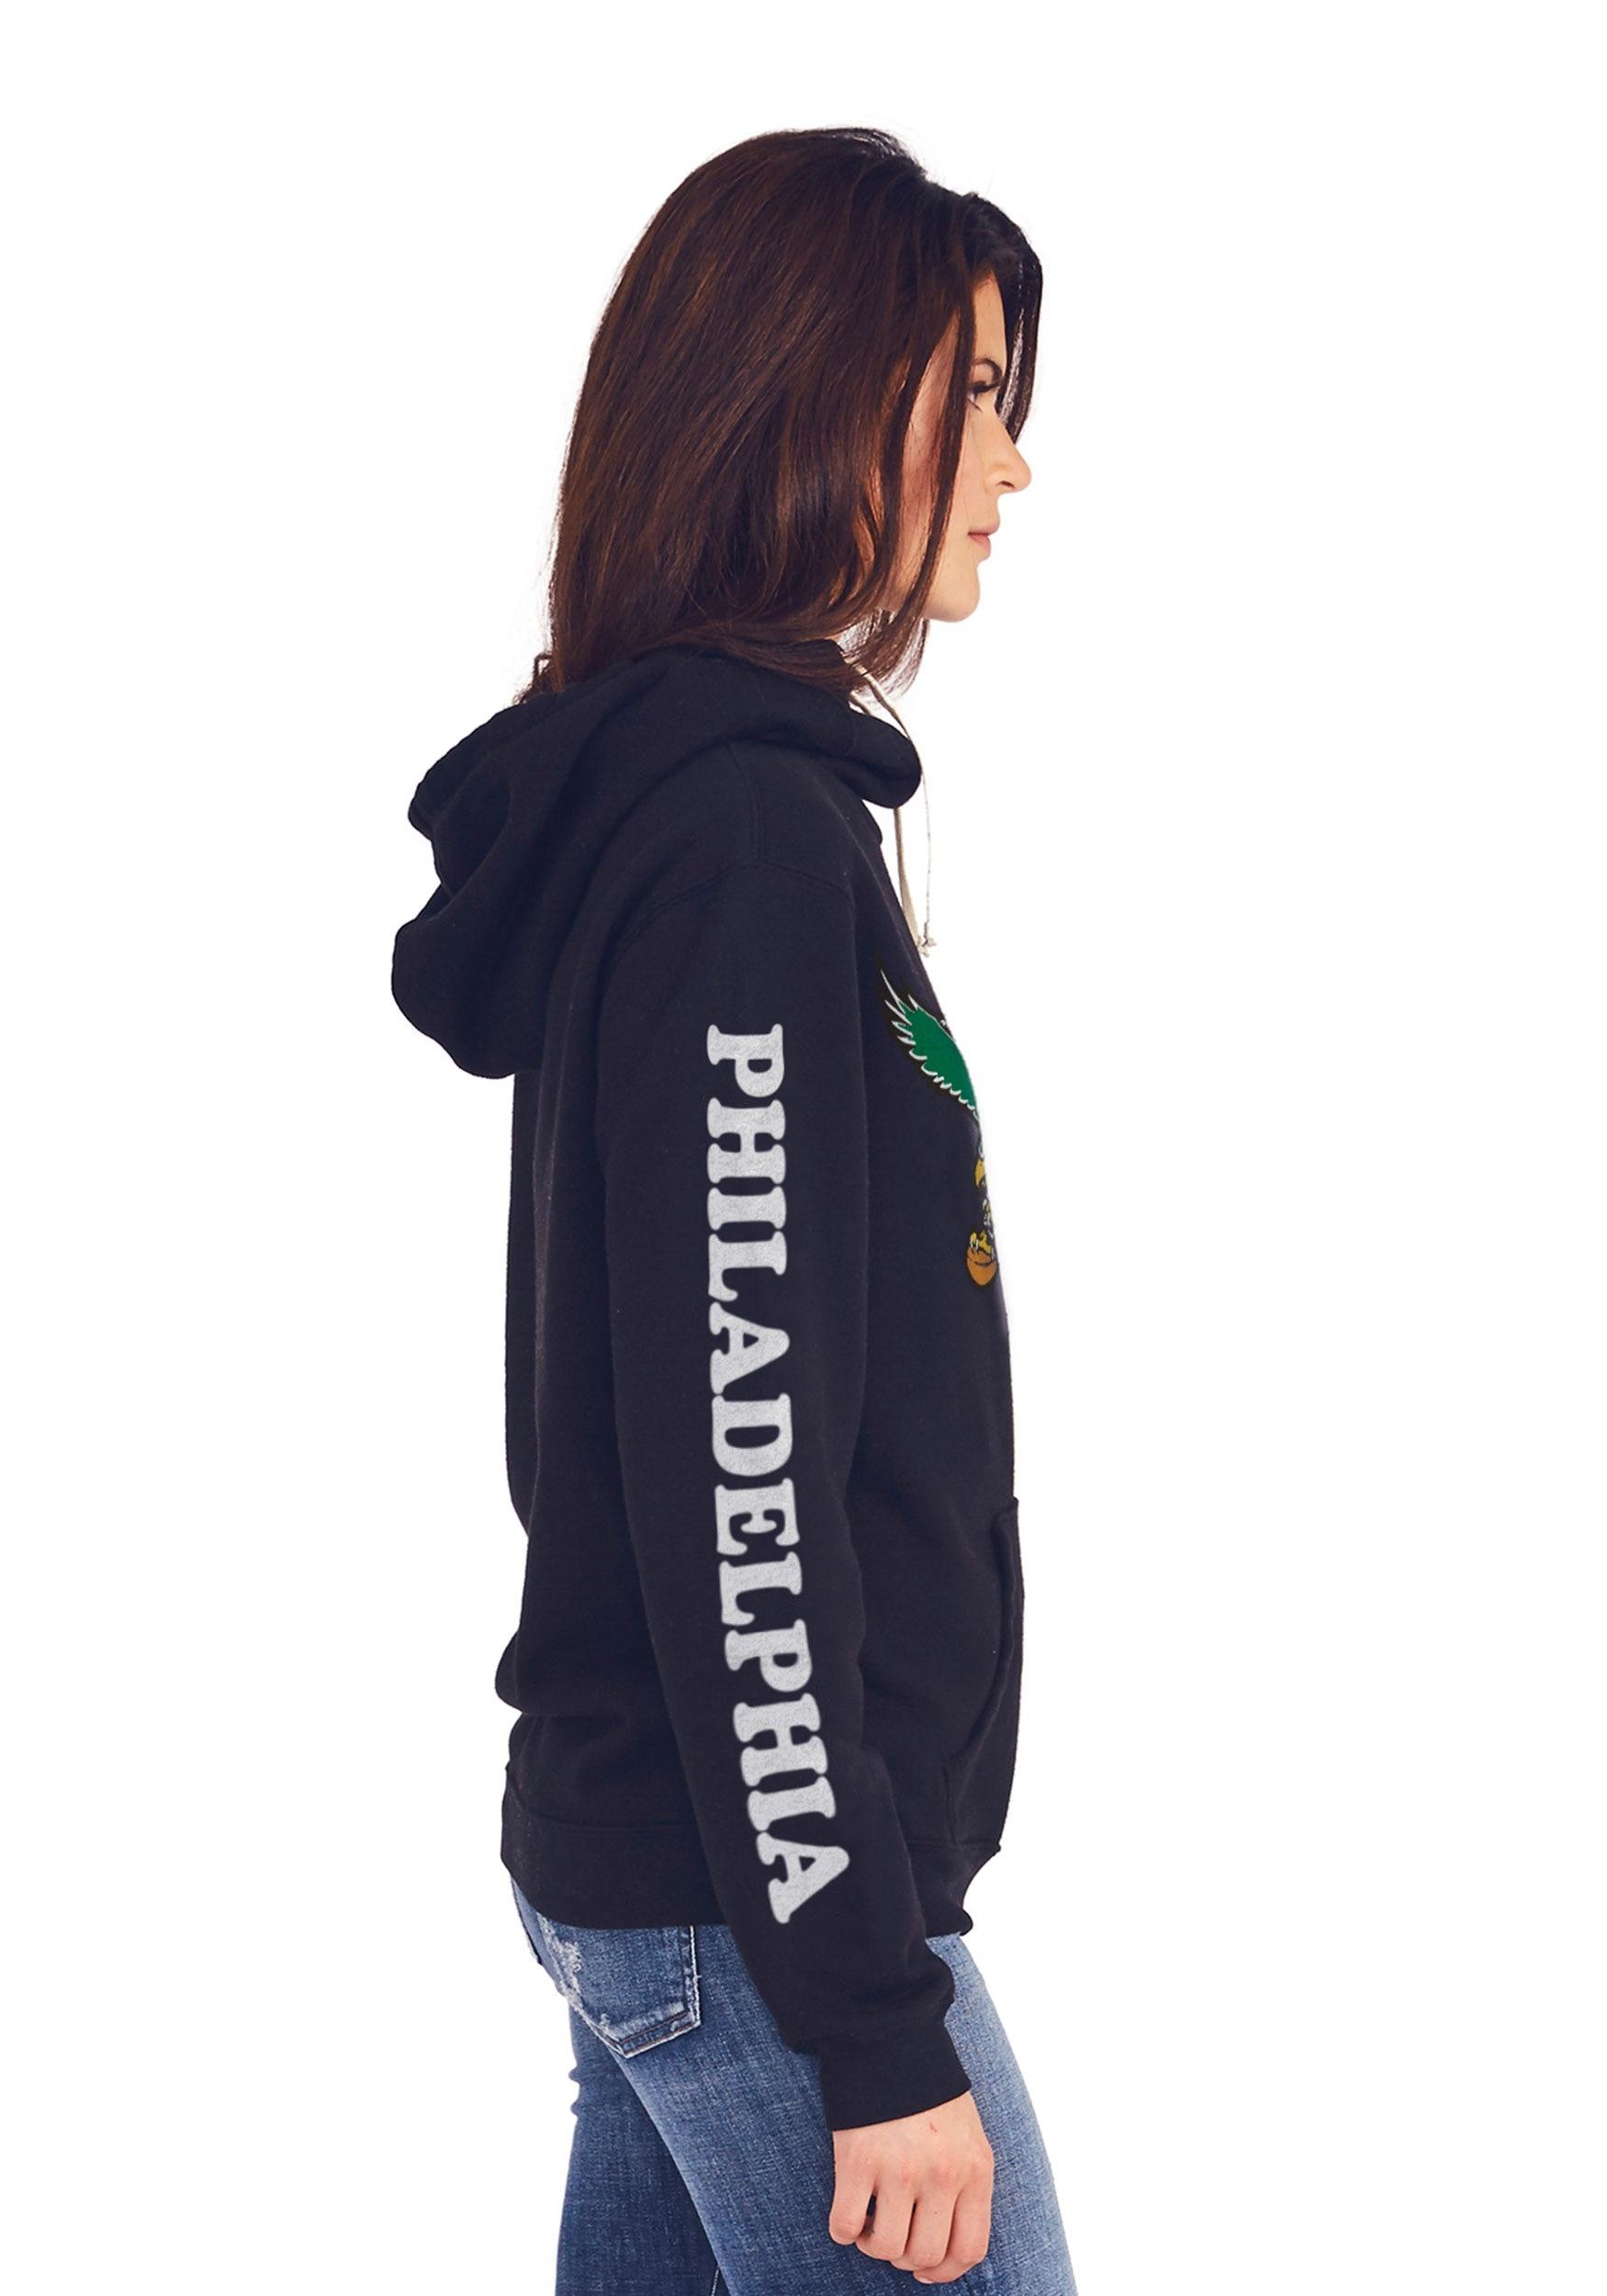 Philadelphia Eagles Women's Cowl Neck Hooded Sweatshirt